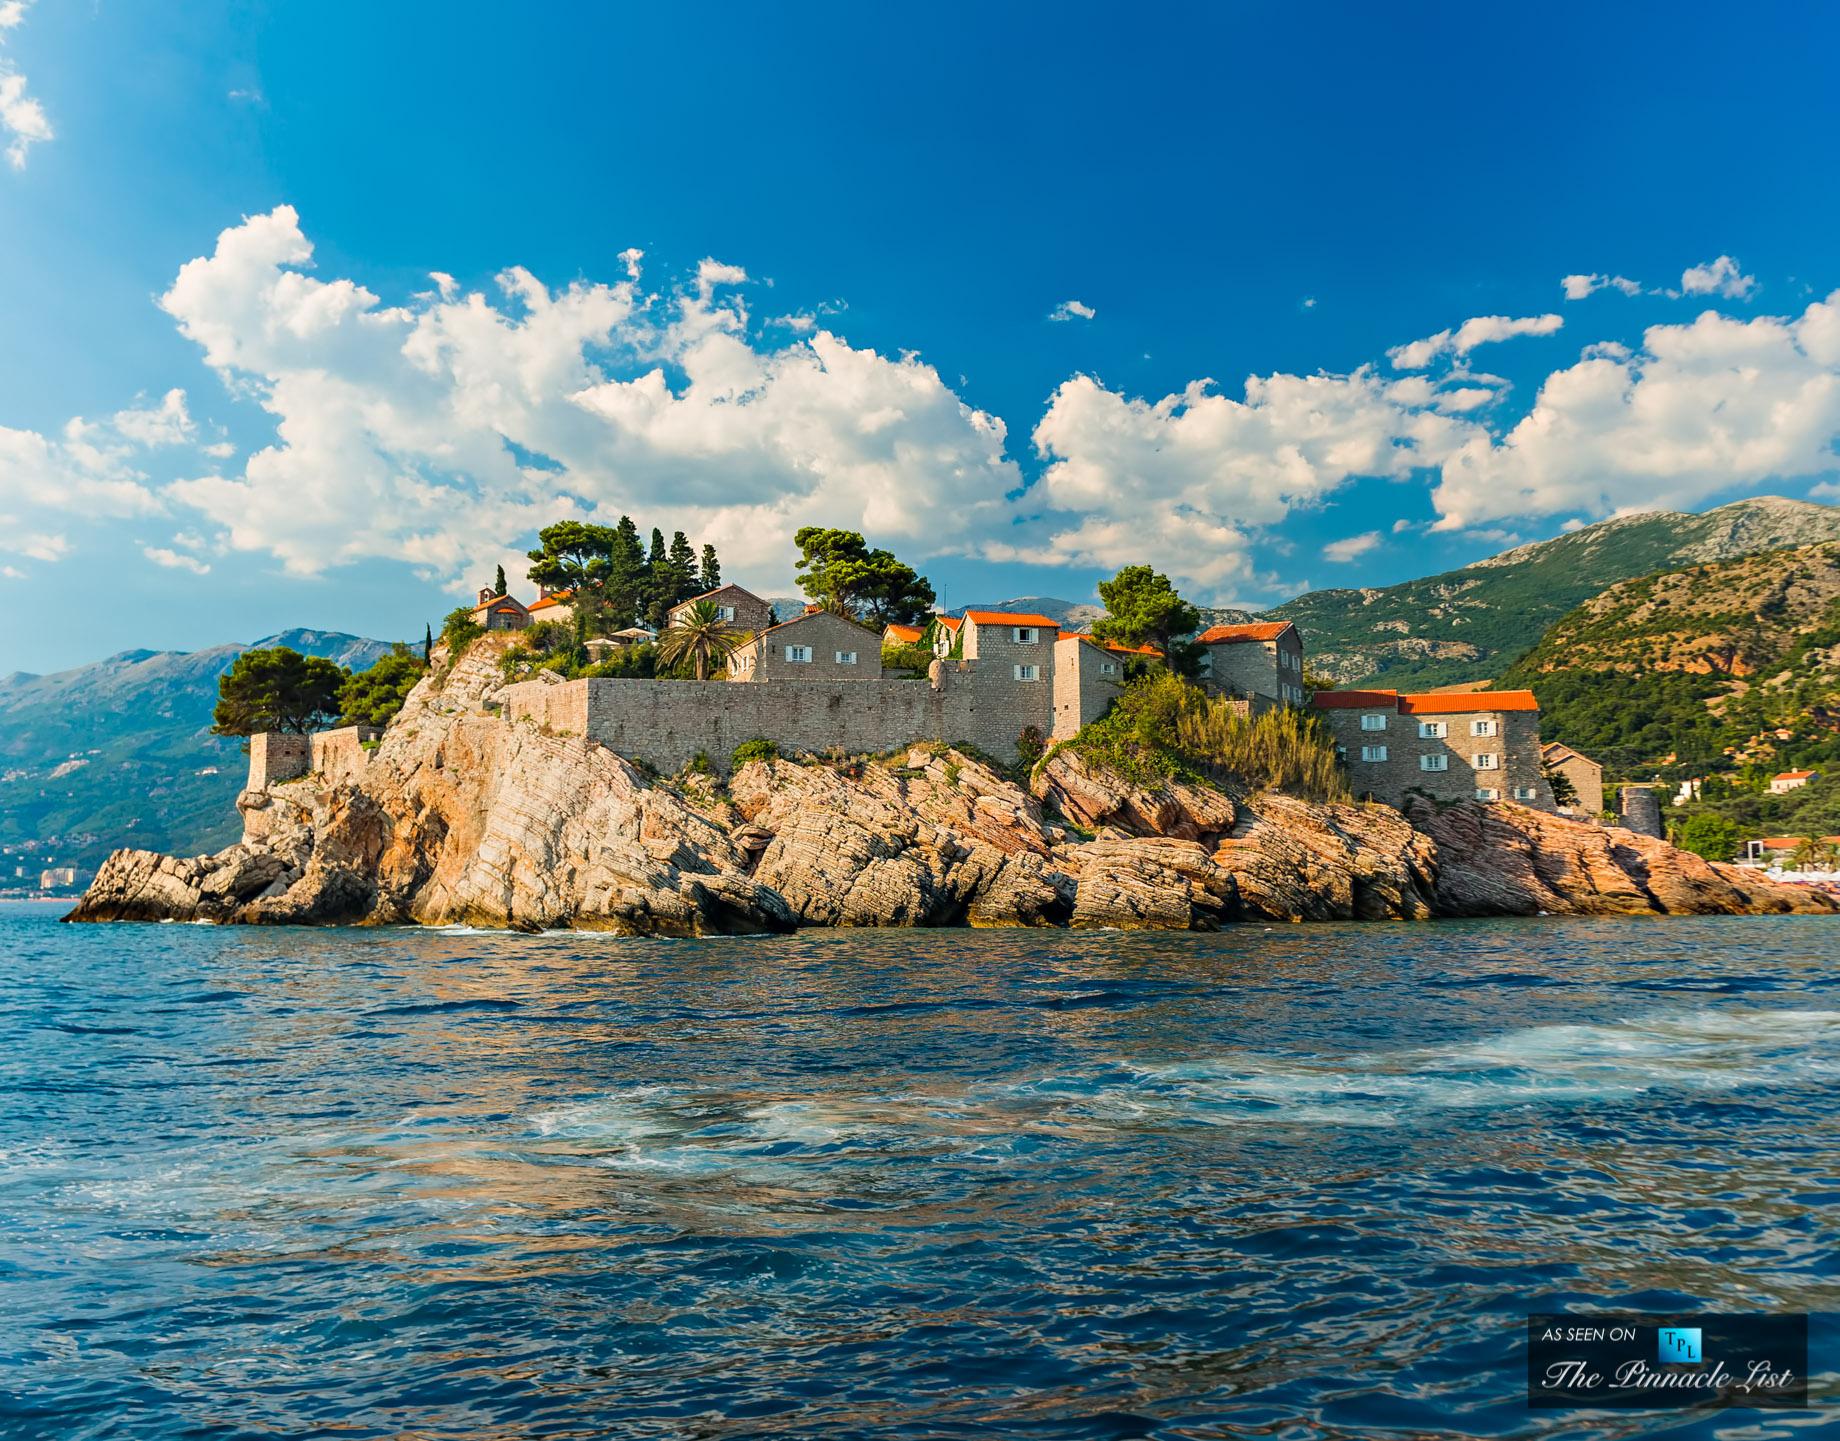 Sveti Stefan, Montenegro - Top 5 Secret Luxury Locations in Eastern Europe